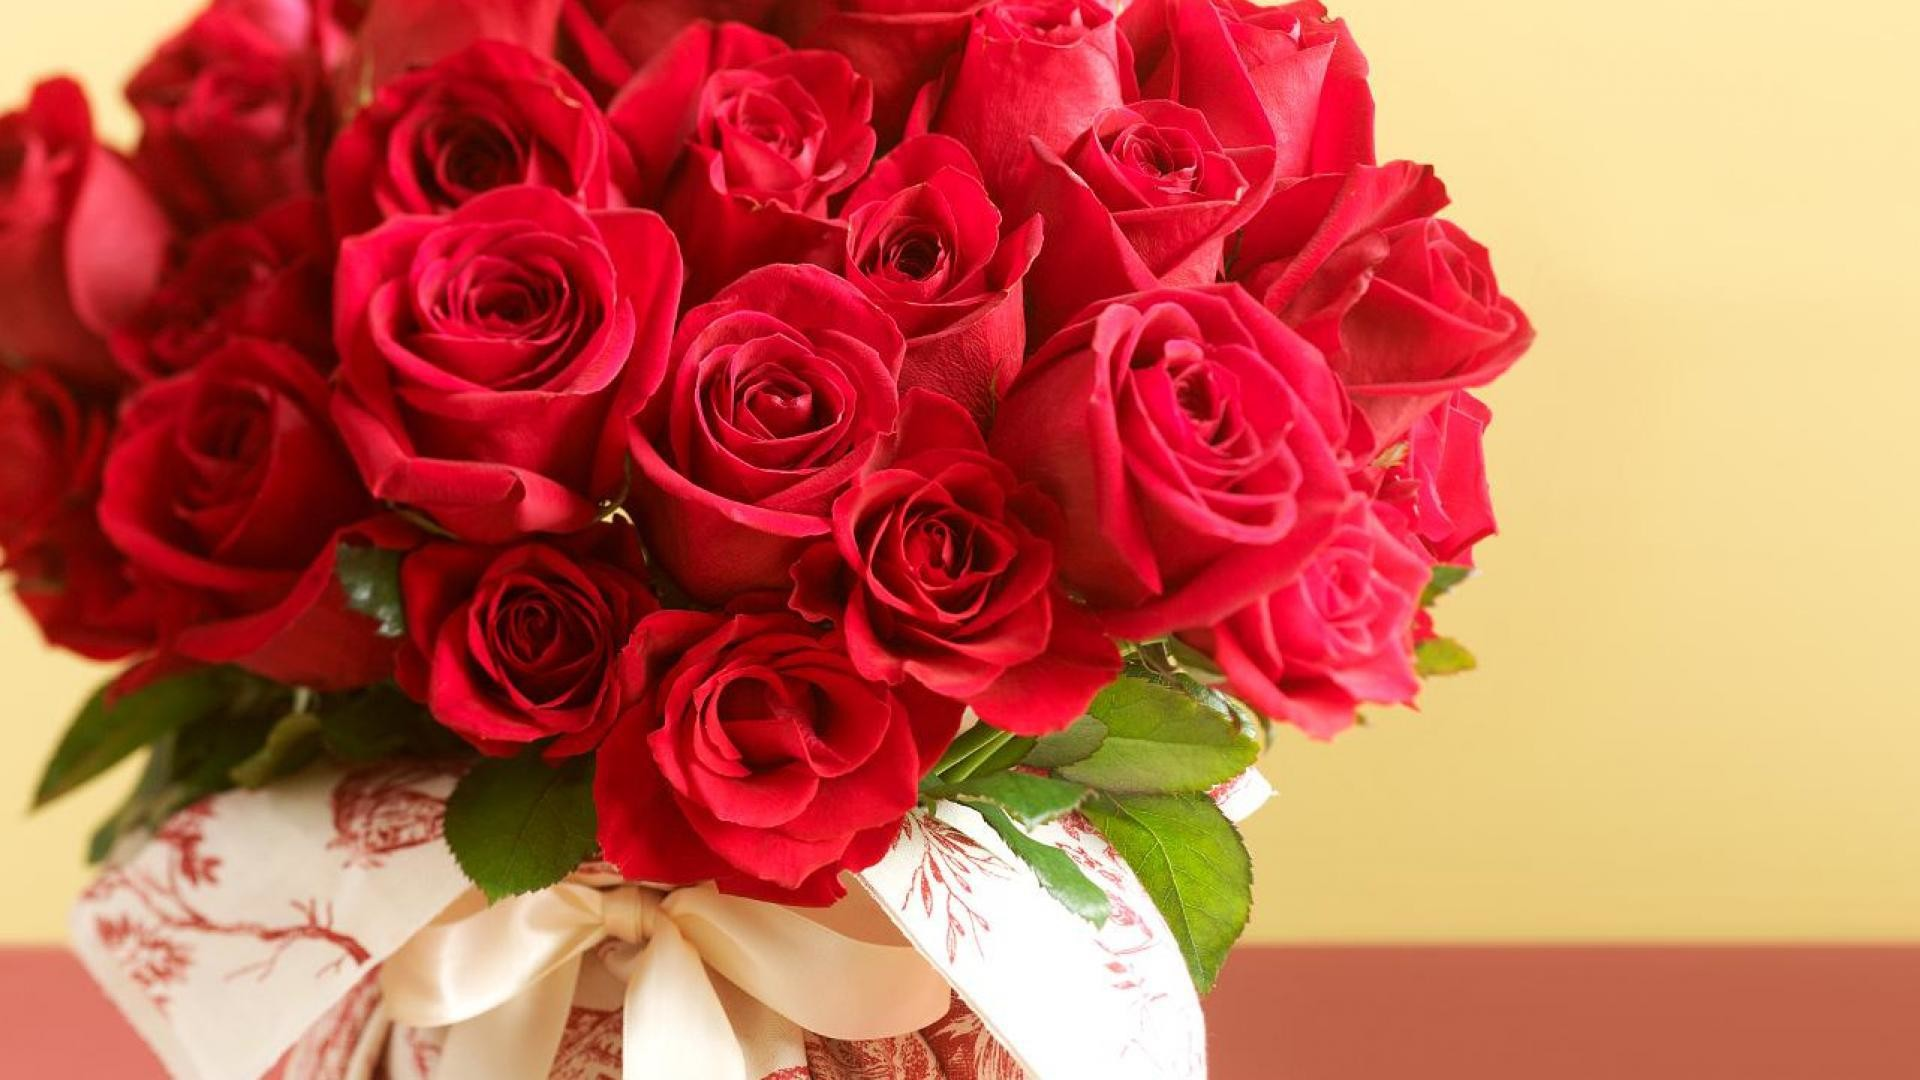 Roses wallpaper for desktop 46 images - Rose desktop wallpaper hd ...